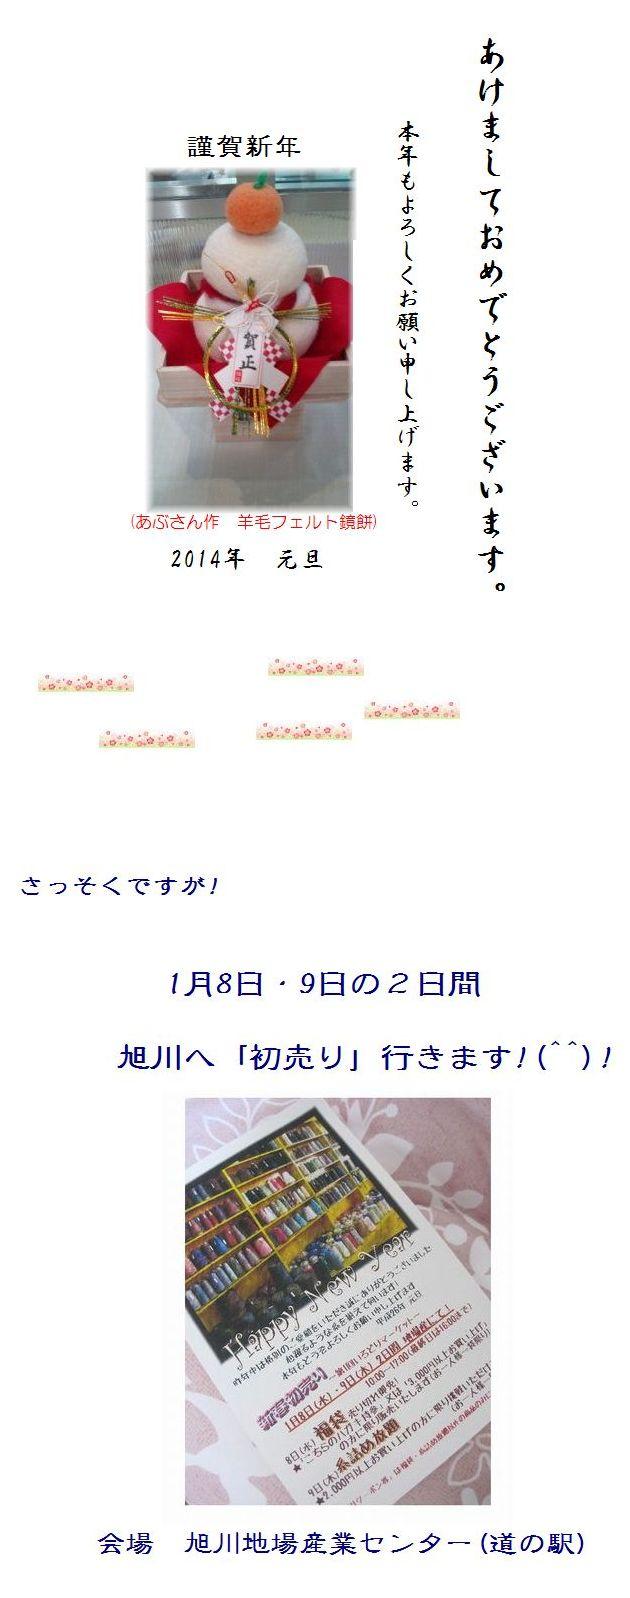 c0221884_1725778.jpg